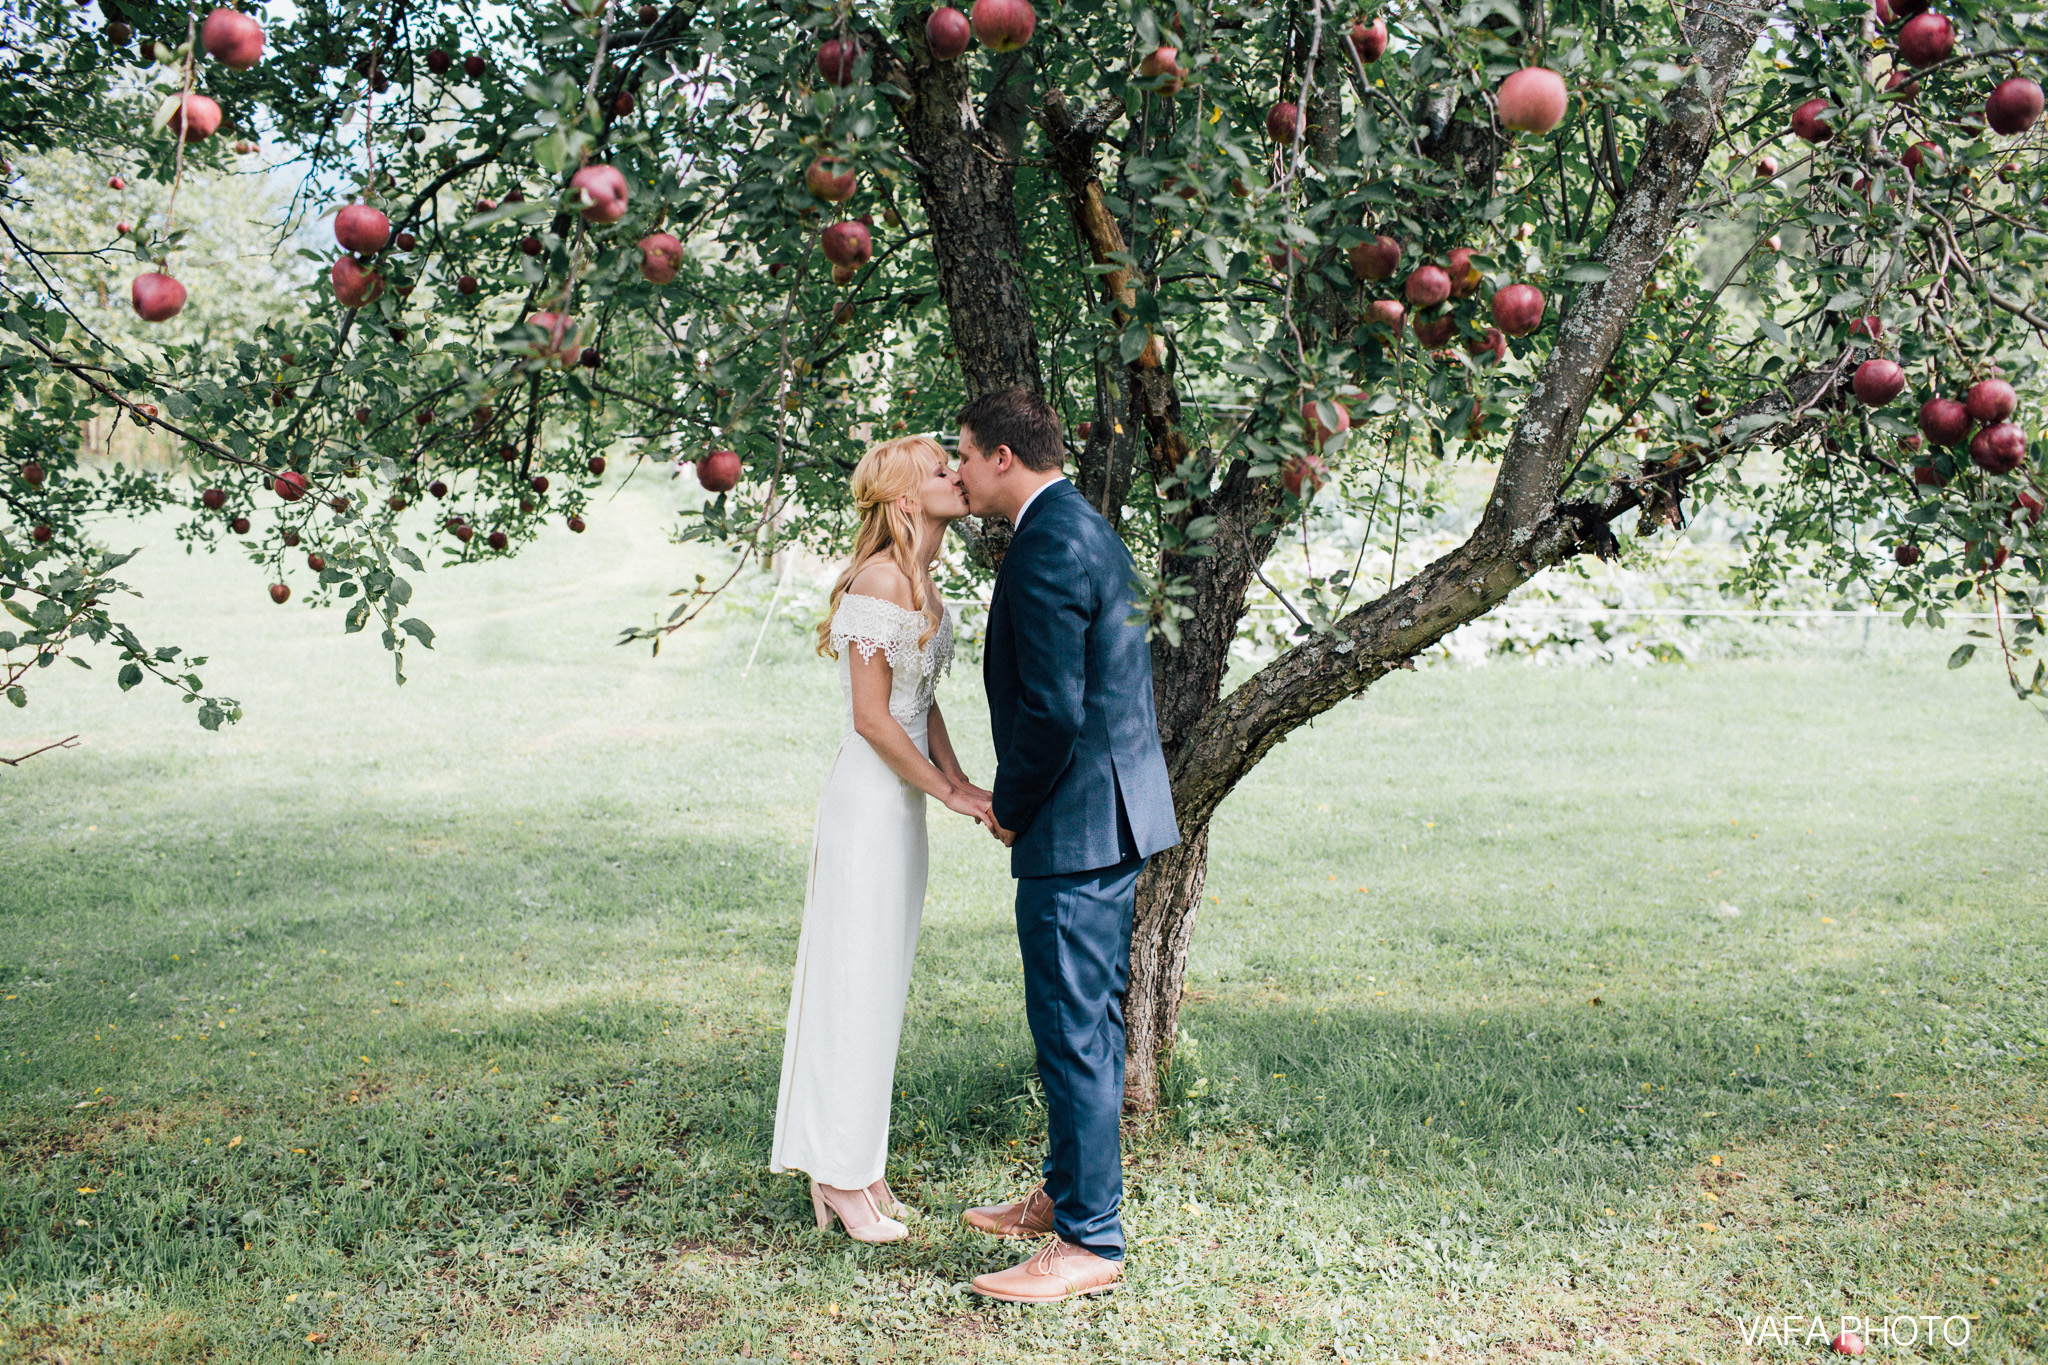 Belsolda-Farm-Wedding-Christy-Eric-Vafa-Photo-55.jpg